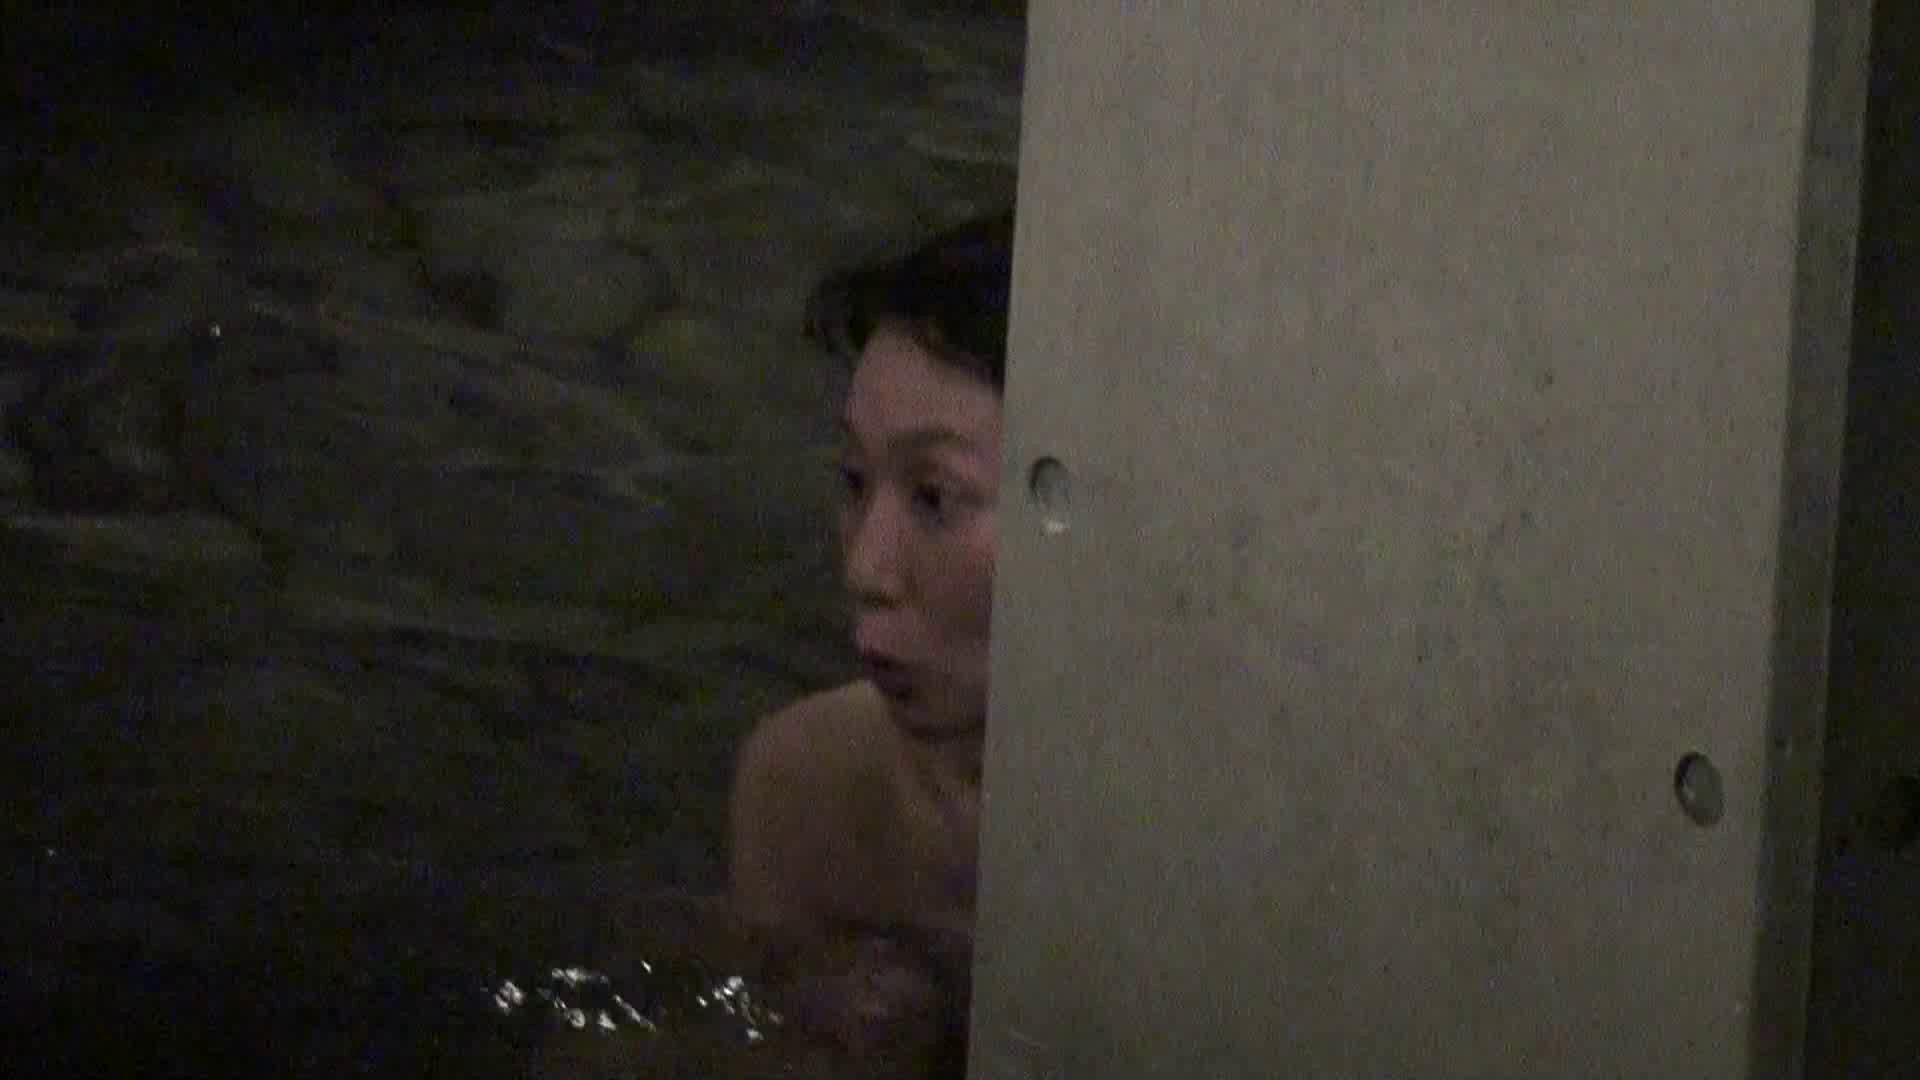 Aquaな露天風呂Vol.367 盗撮 | HなOL  96pic 36